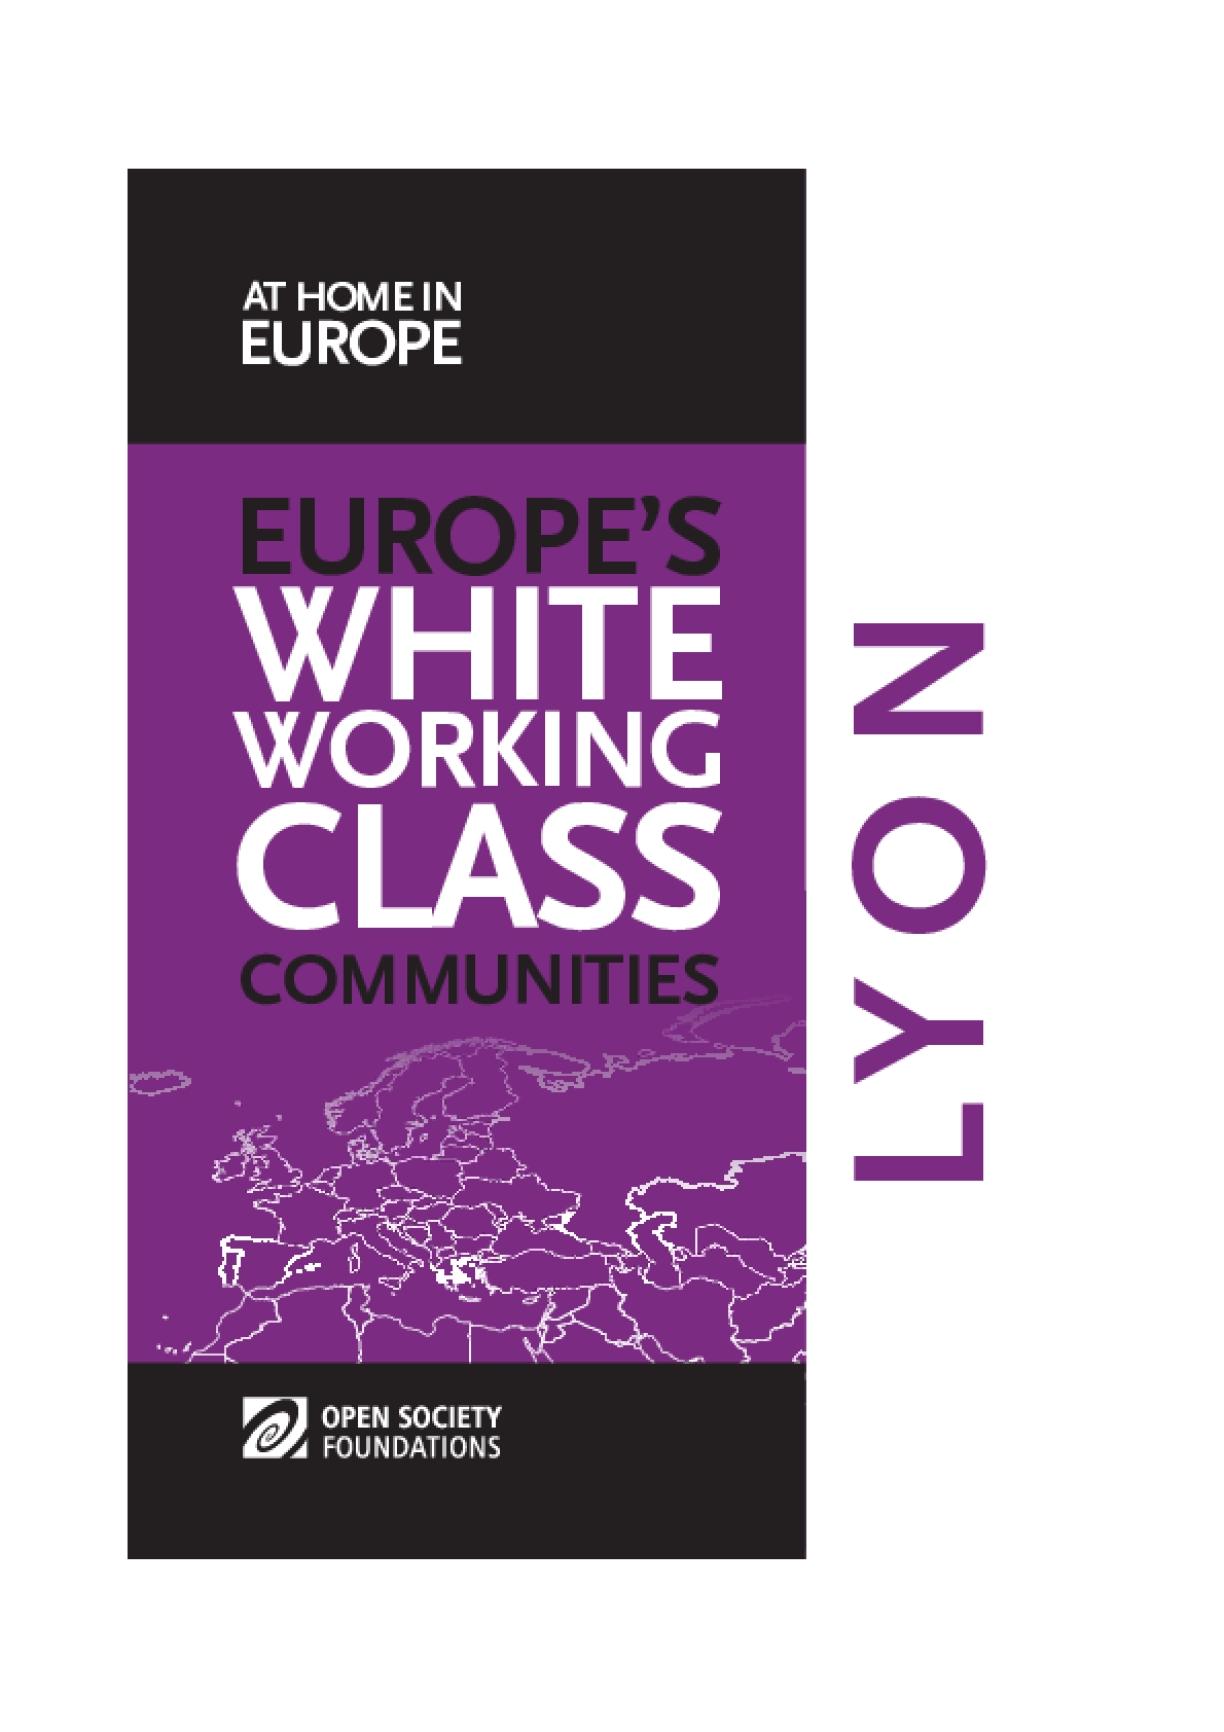 White Working Class Communities in Lyon